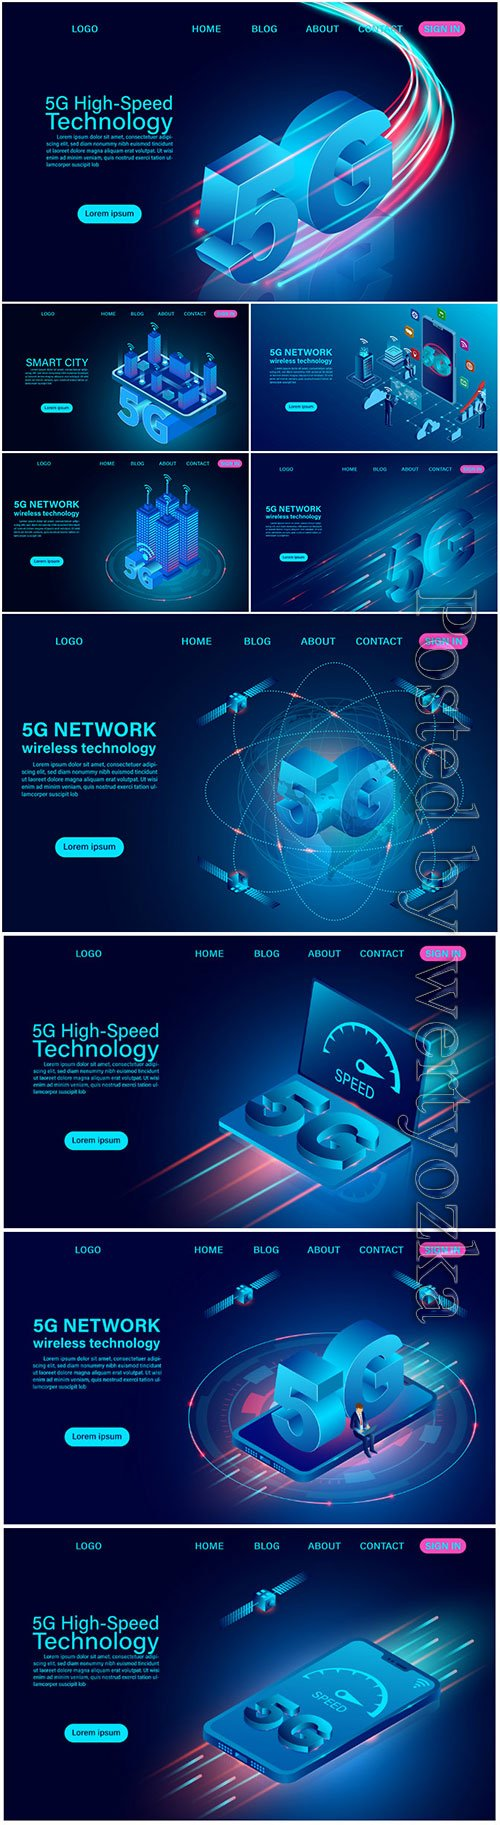 5G network wireless technology high speed isometric flat design vector